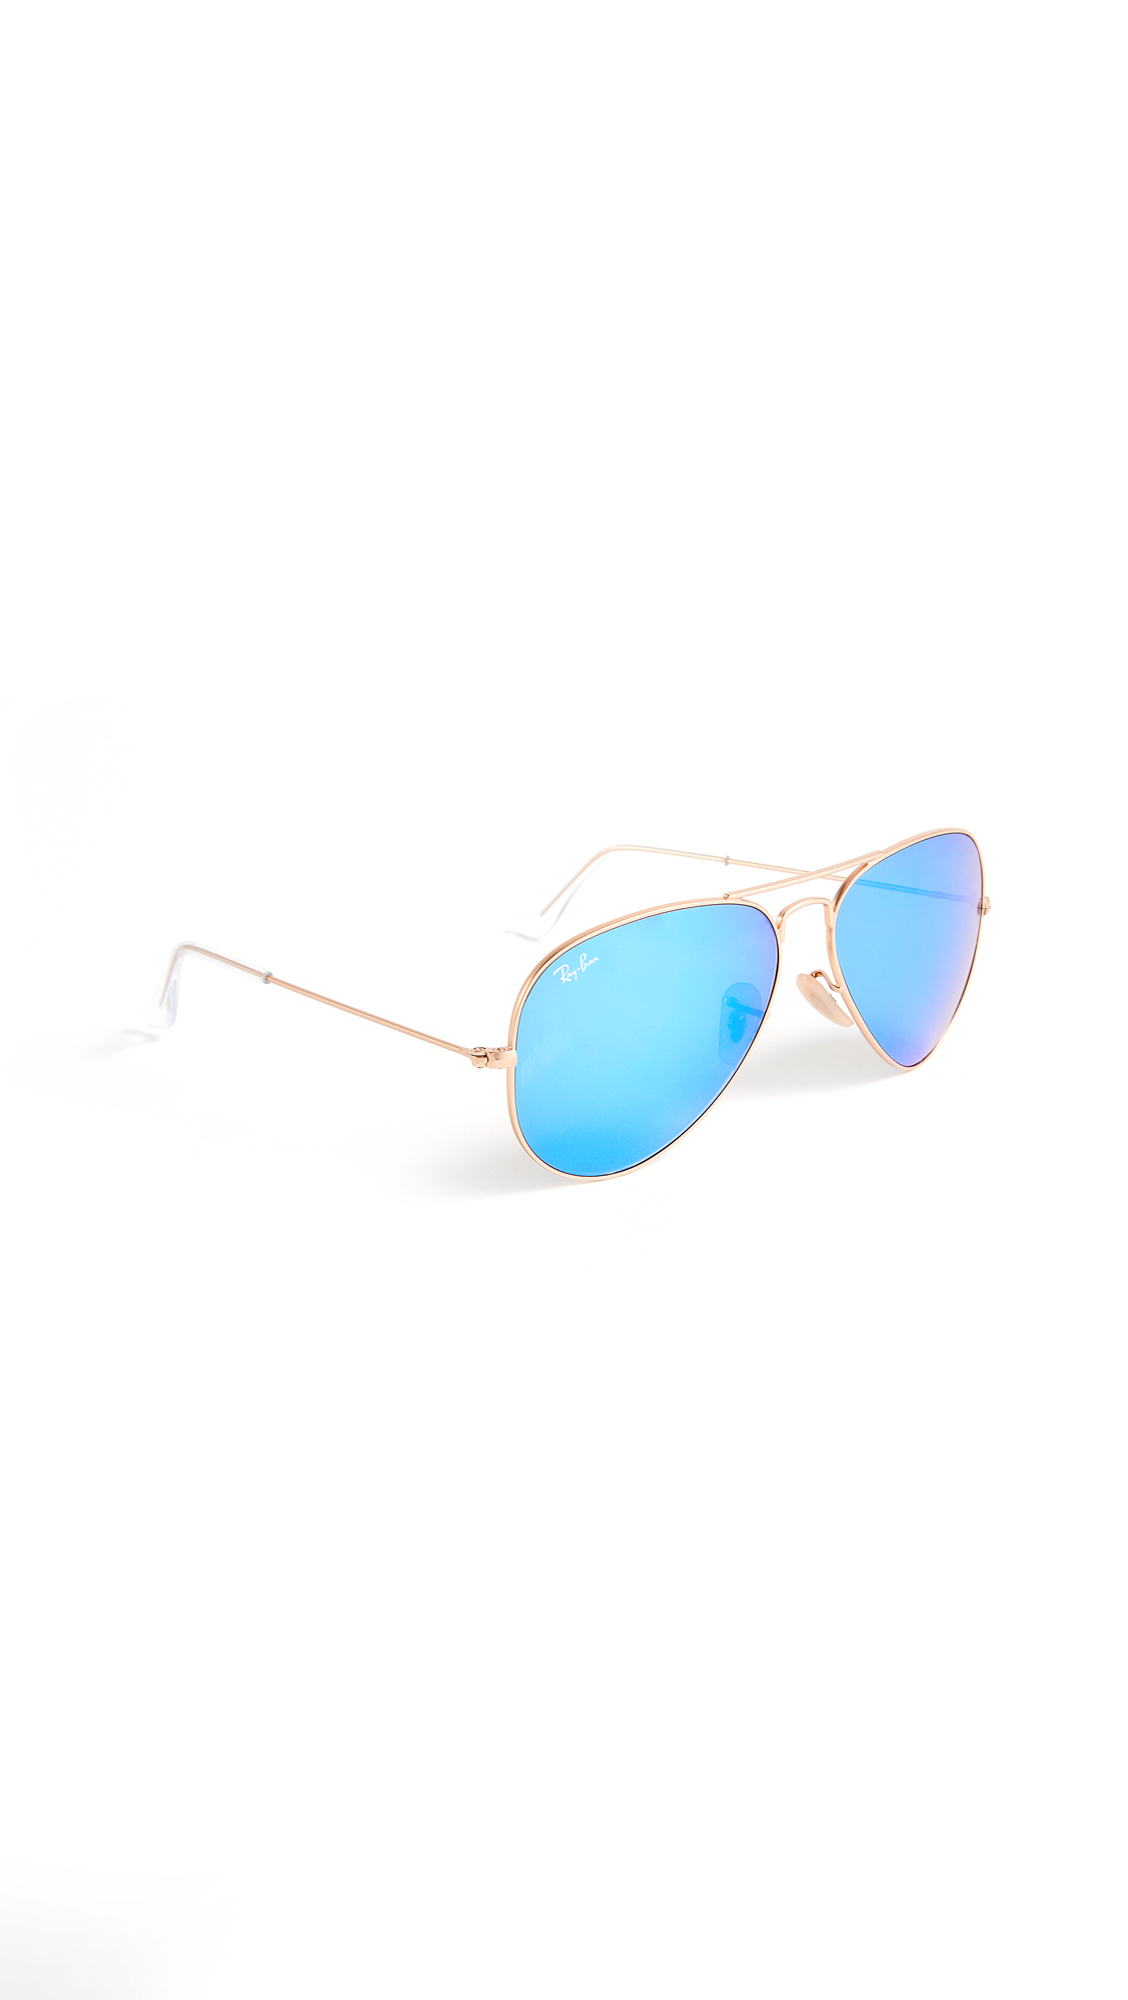 Ray-Ban Mirrored Matte Classic Aviator Sunglasses In Matte Gold/Blue Mirror